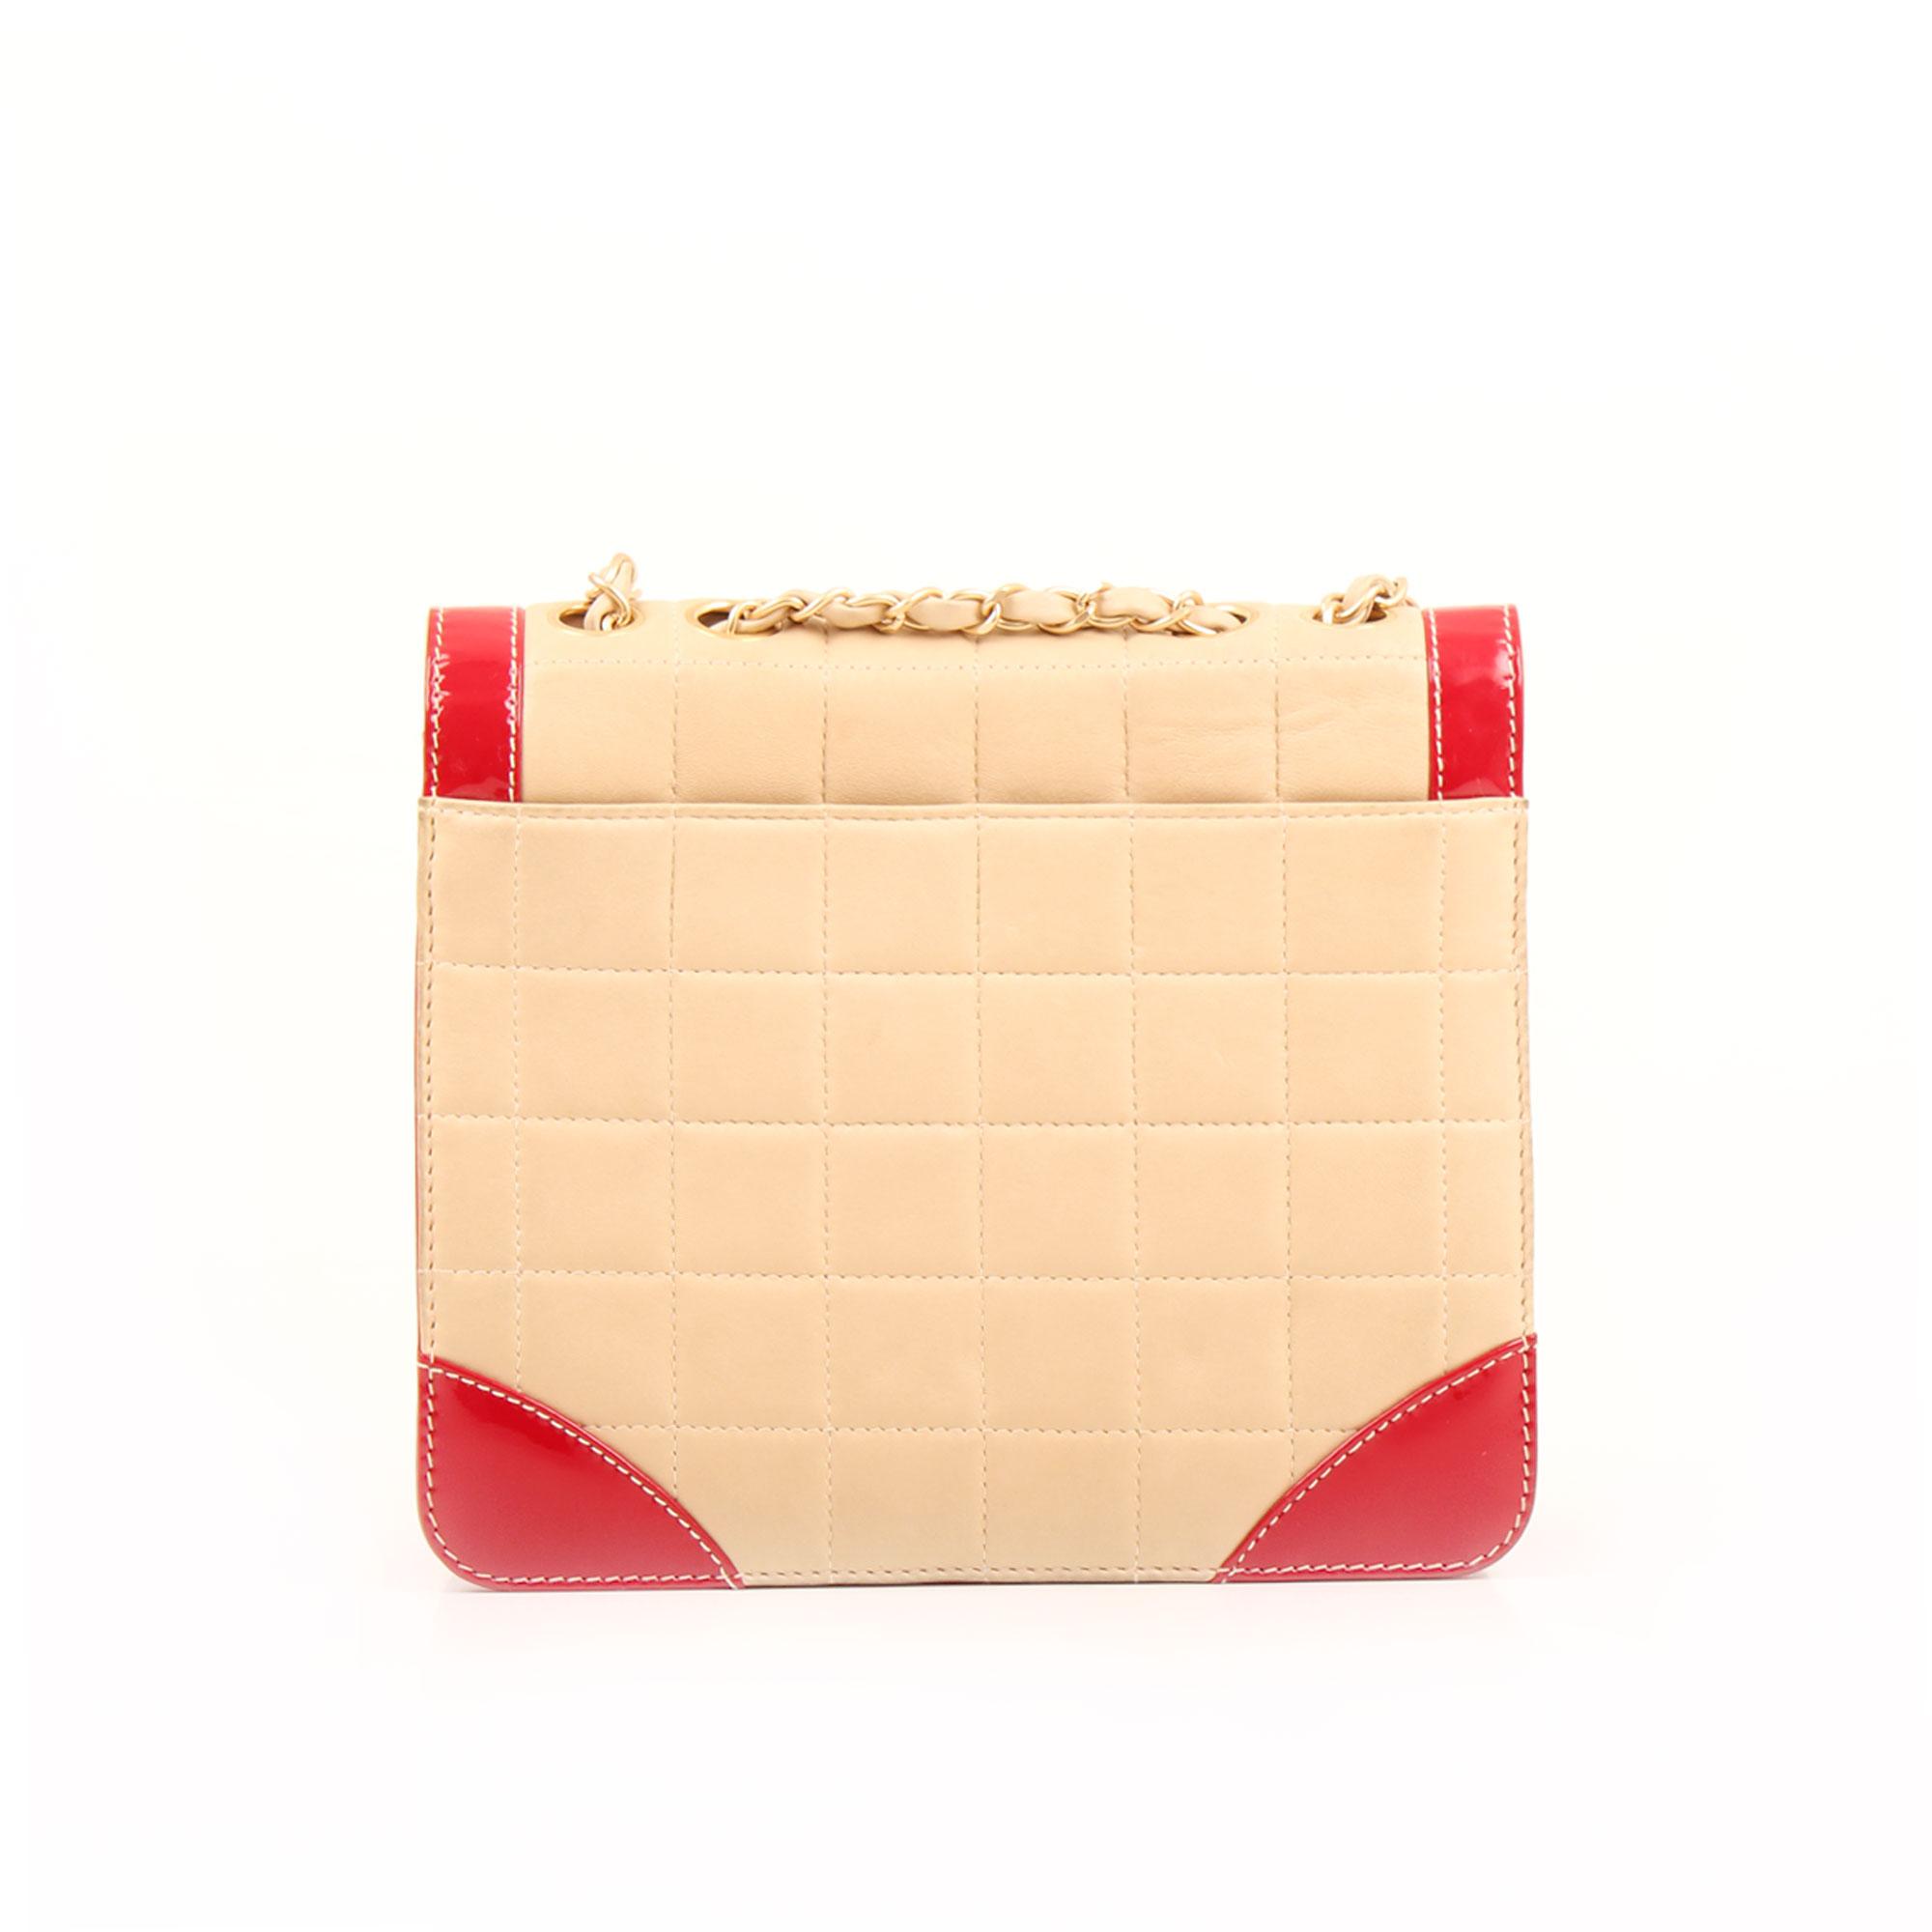 Back image of chanel bicolor choco bar single flap